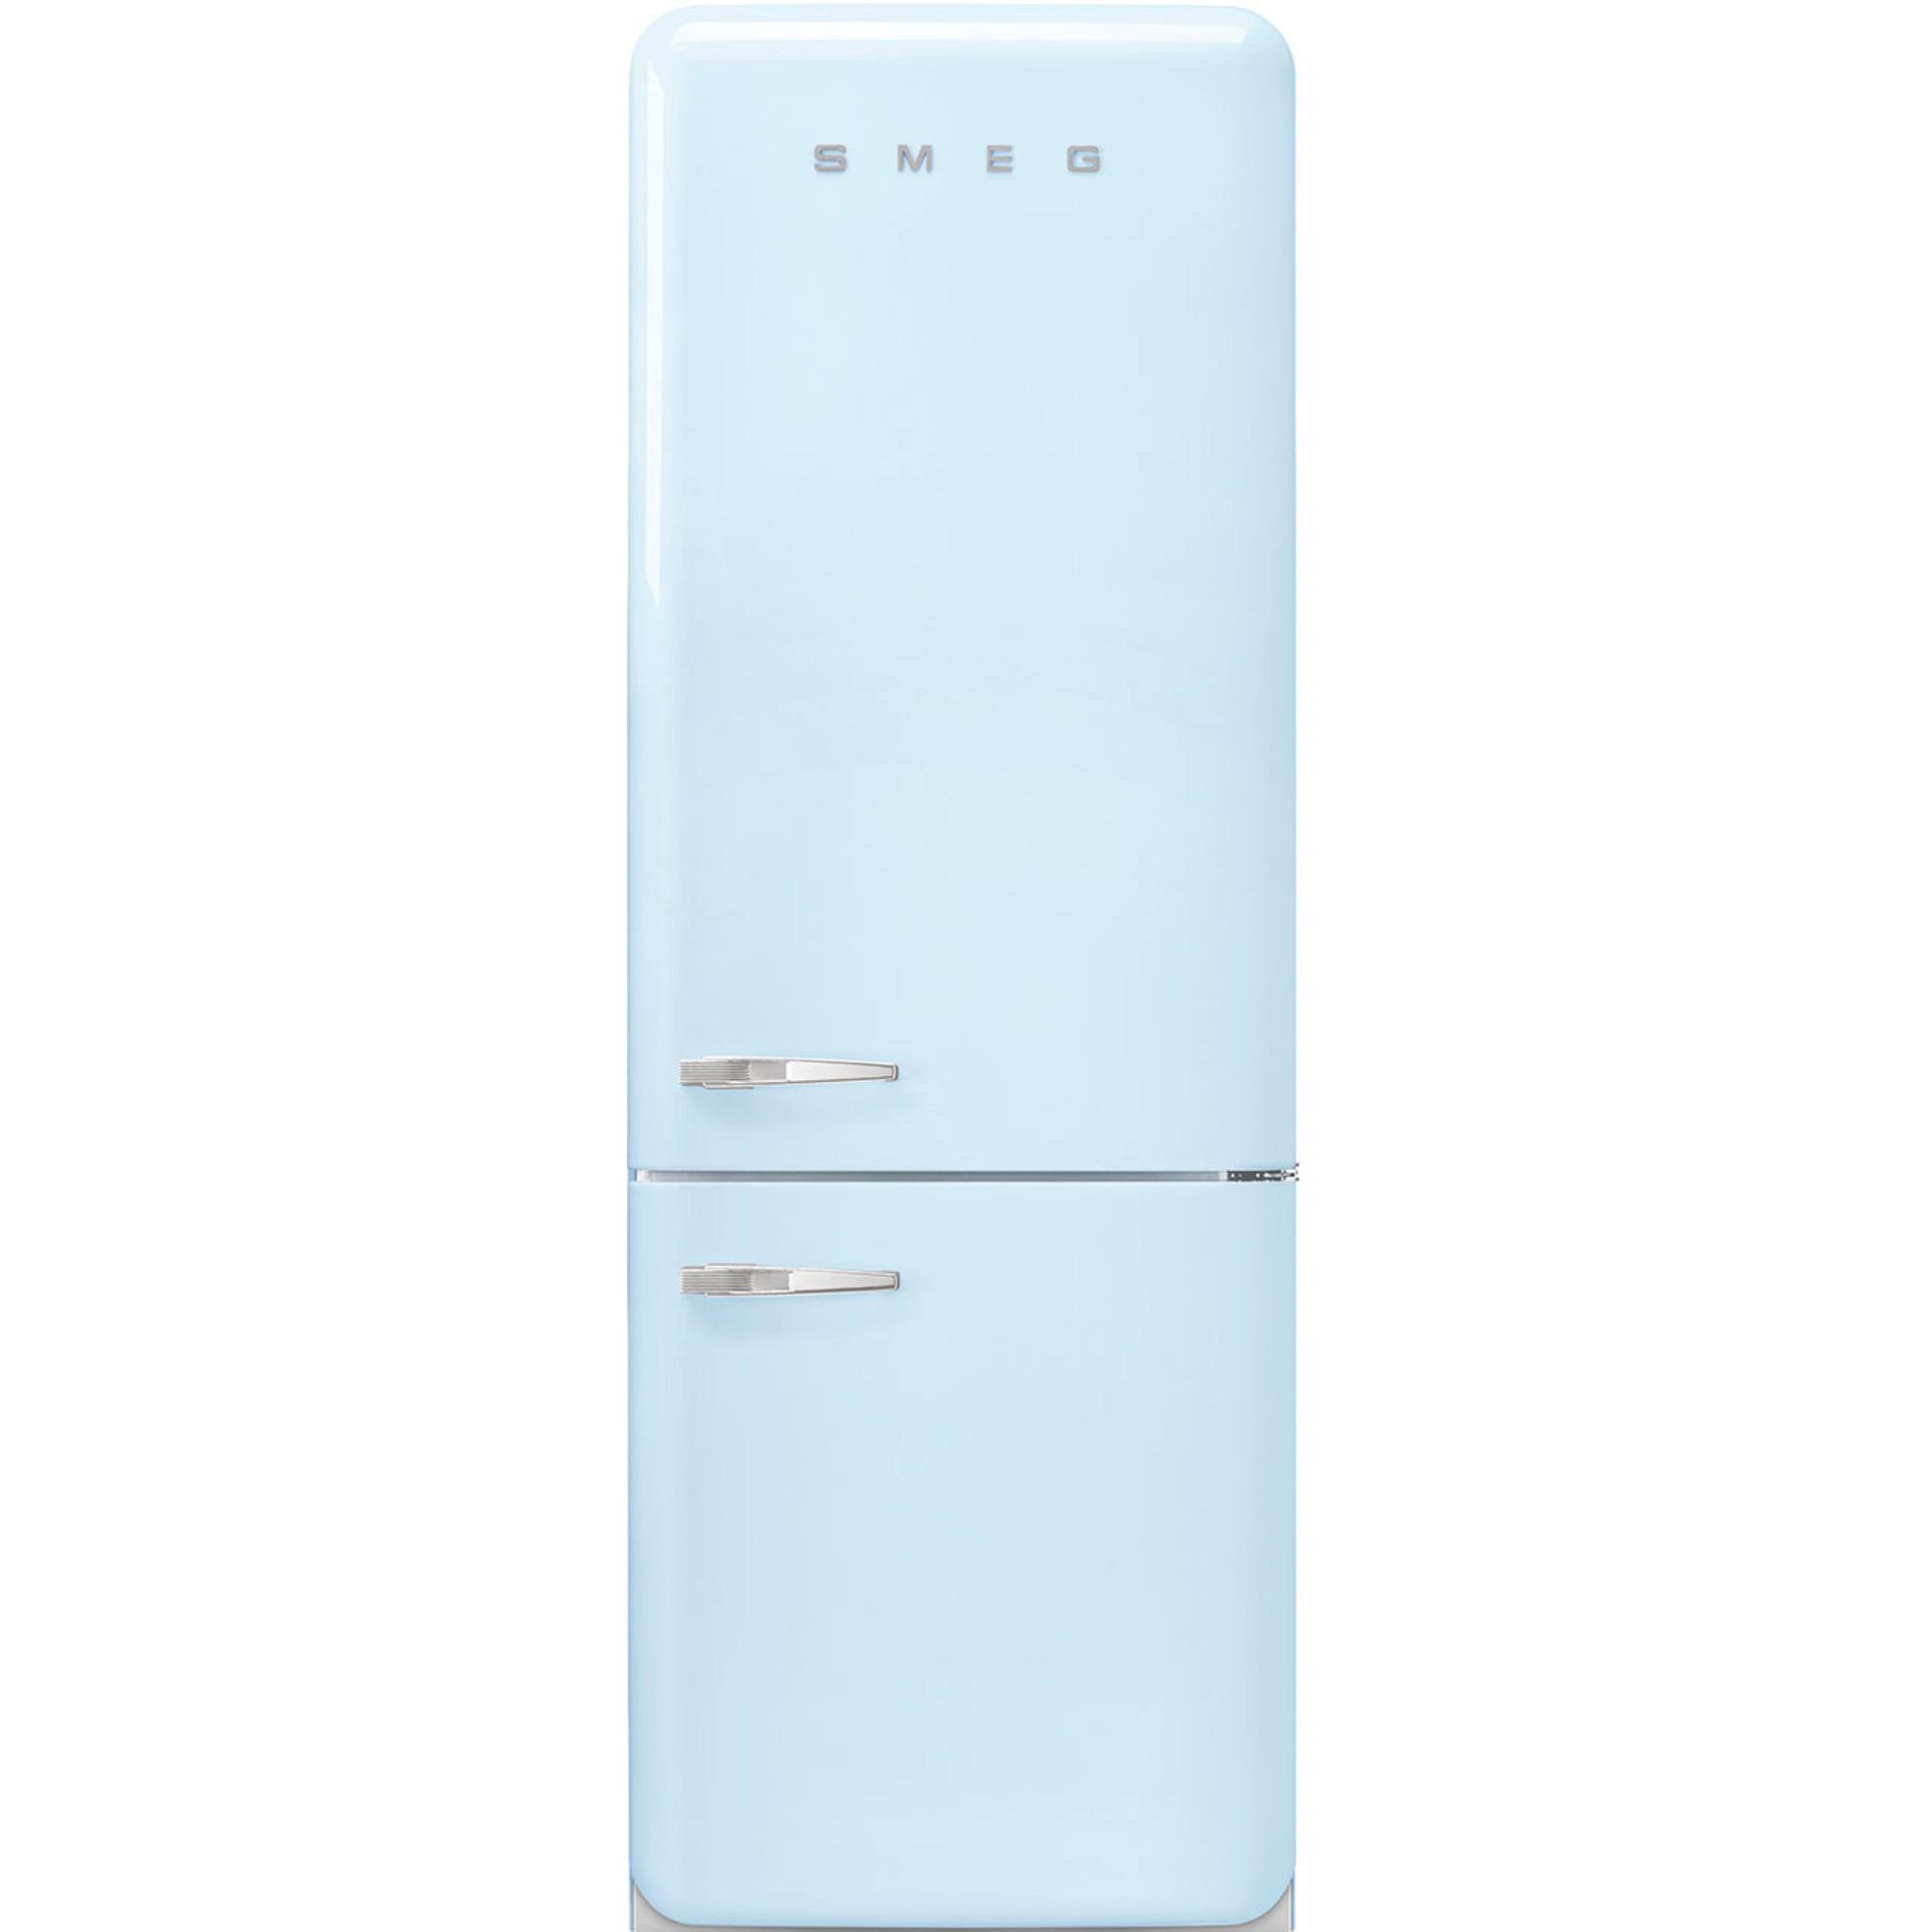 Smeg 205 cm Högerhängt Kylskåp/frys i 50-tals Retrodesign Pastellblå